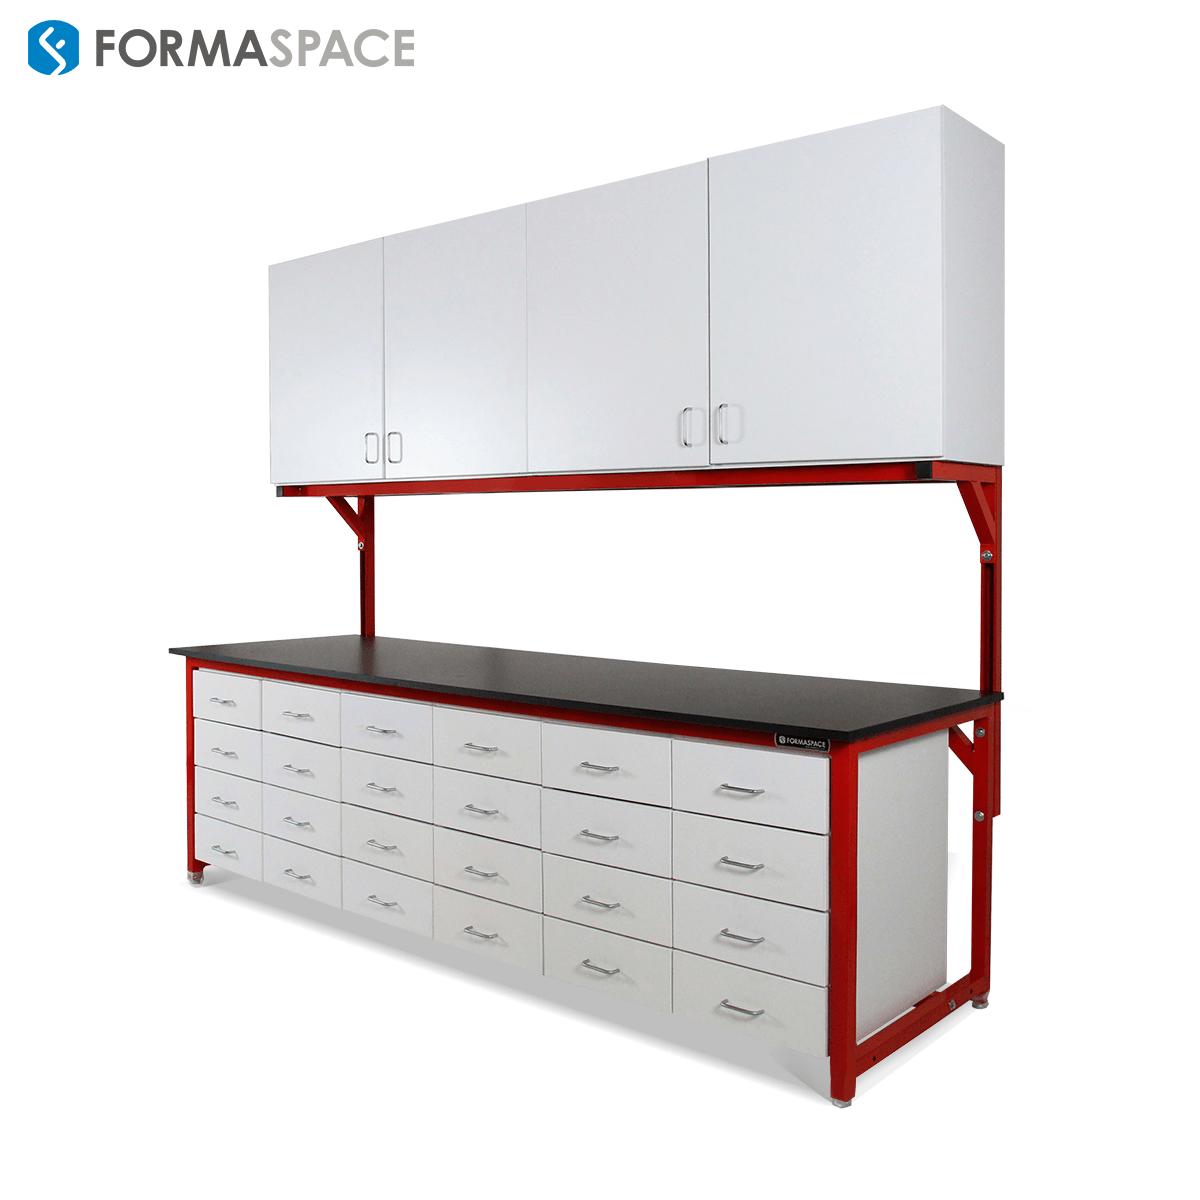 storage workbench with red frame